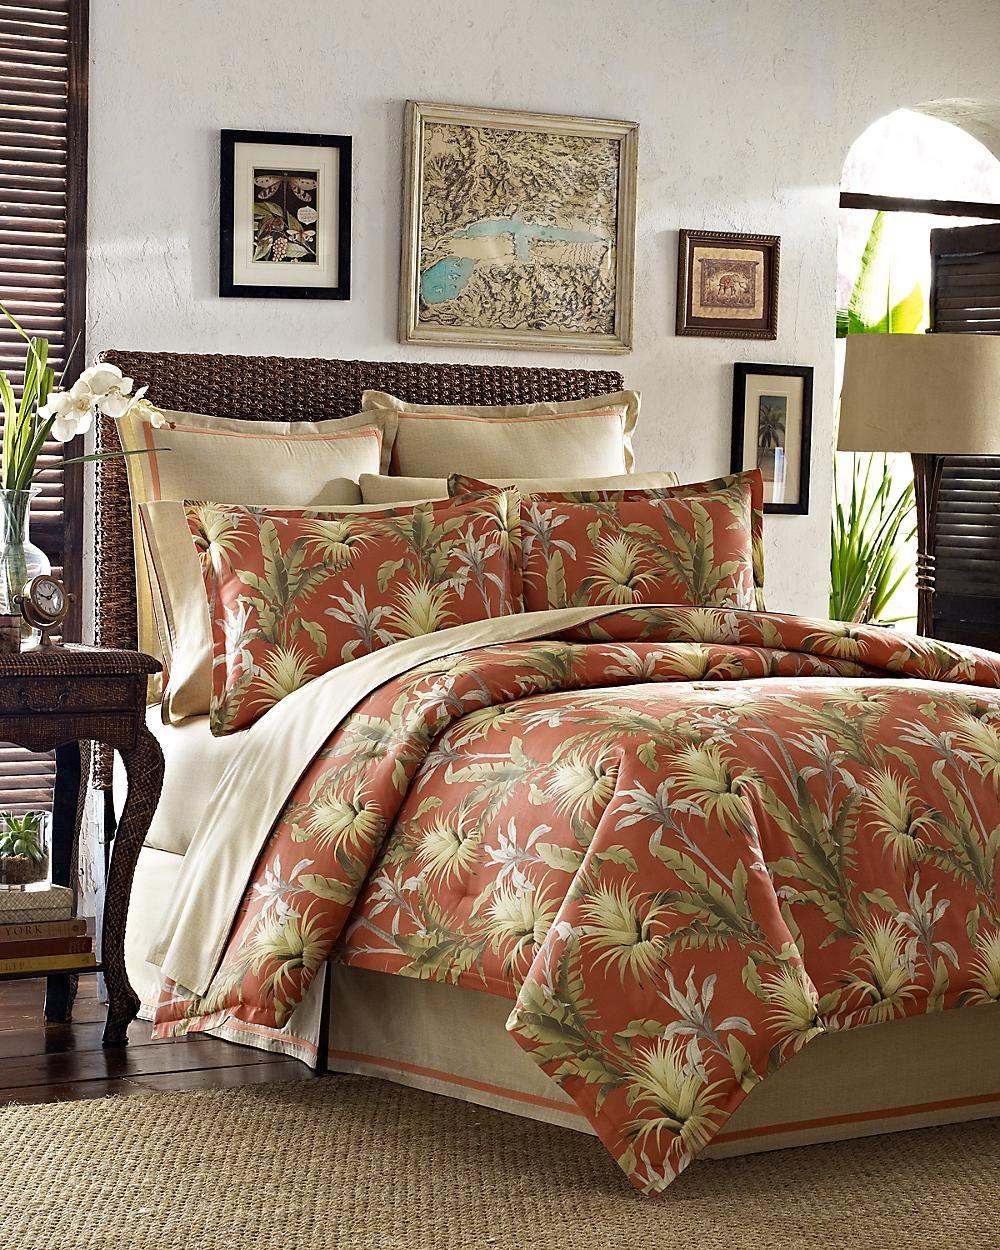 upcitemdb com bahama info sets tommy l duvet king cover set mangroveduvetsettb comforter barcode upc